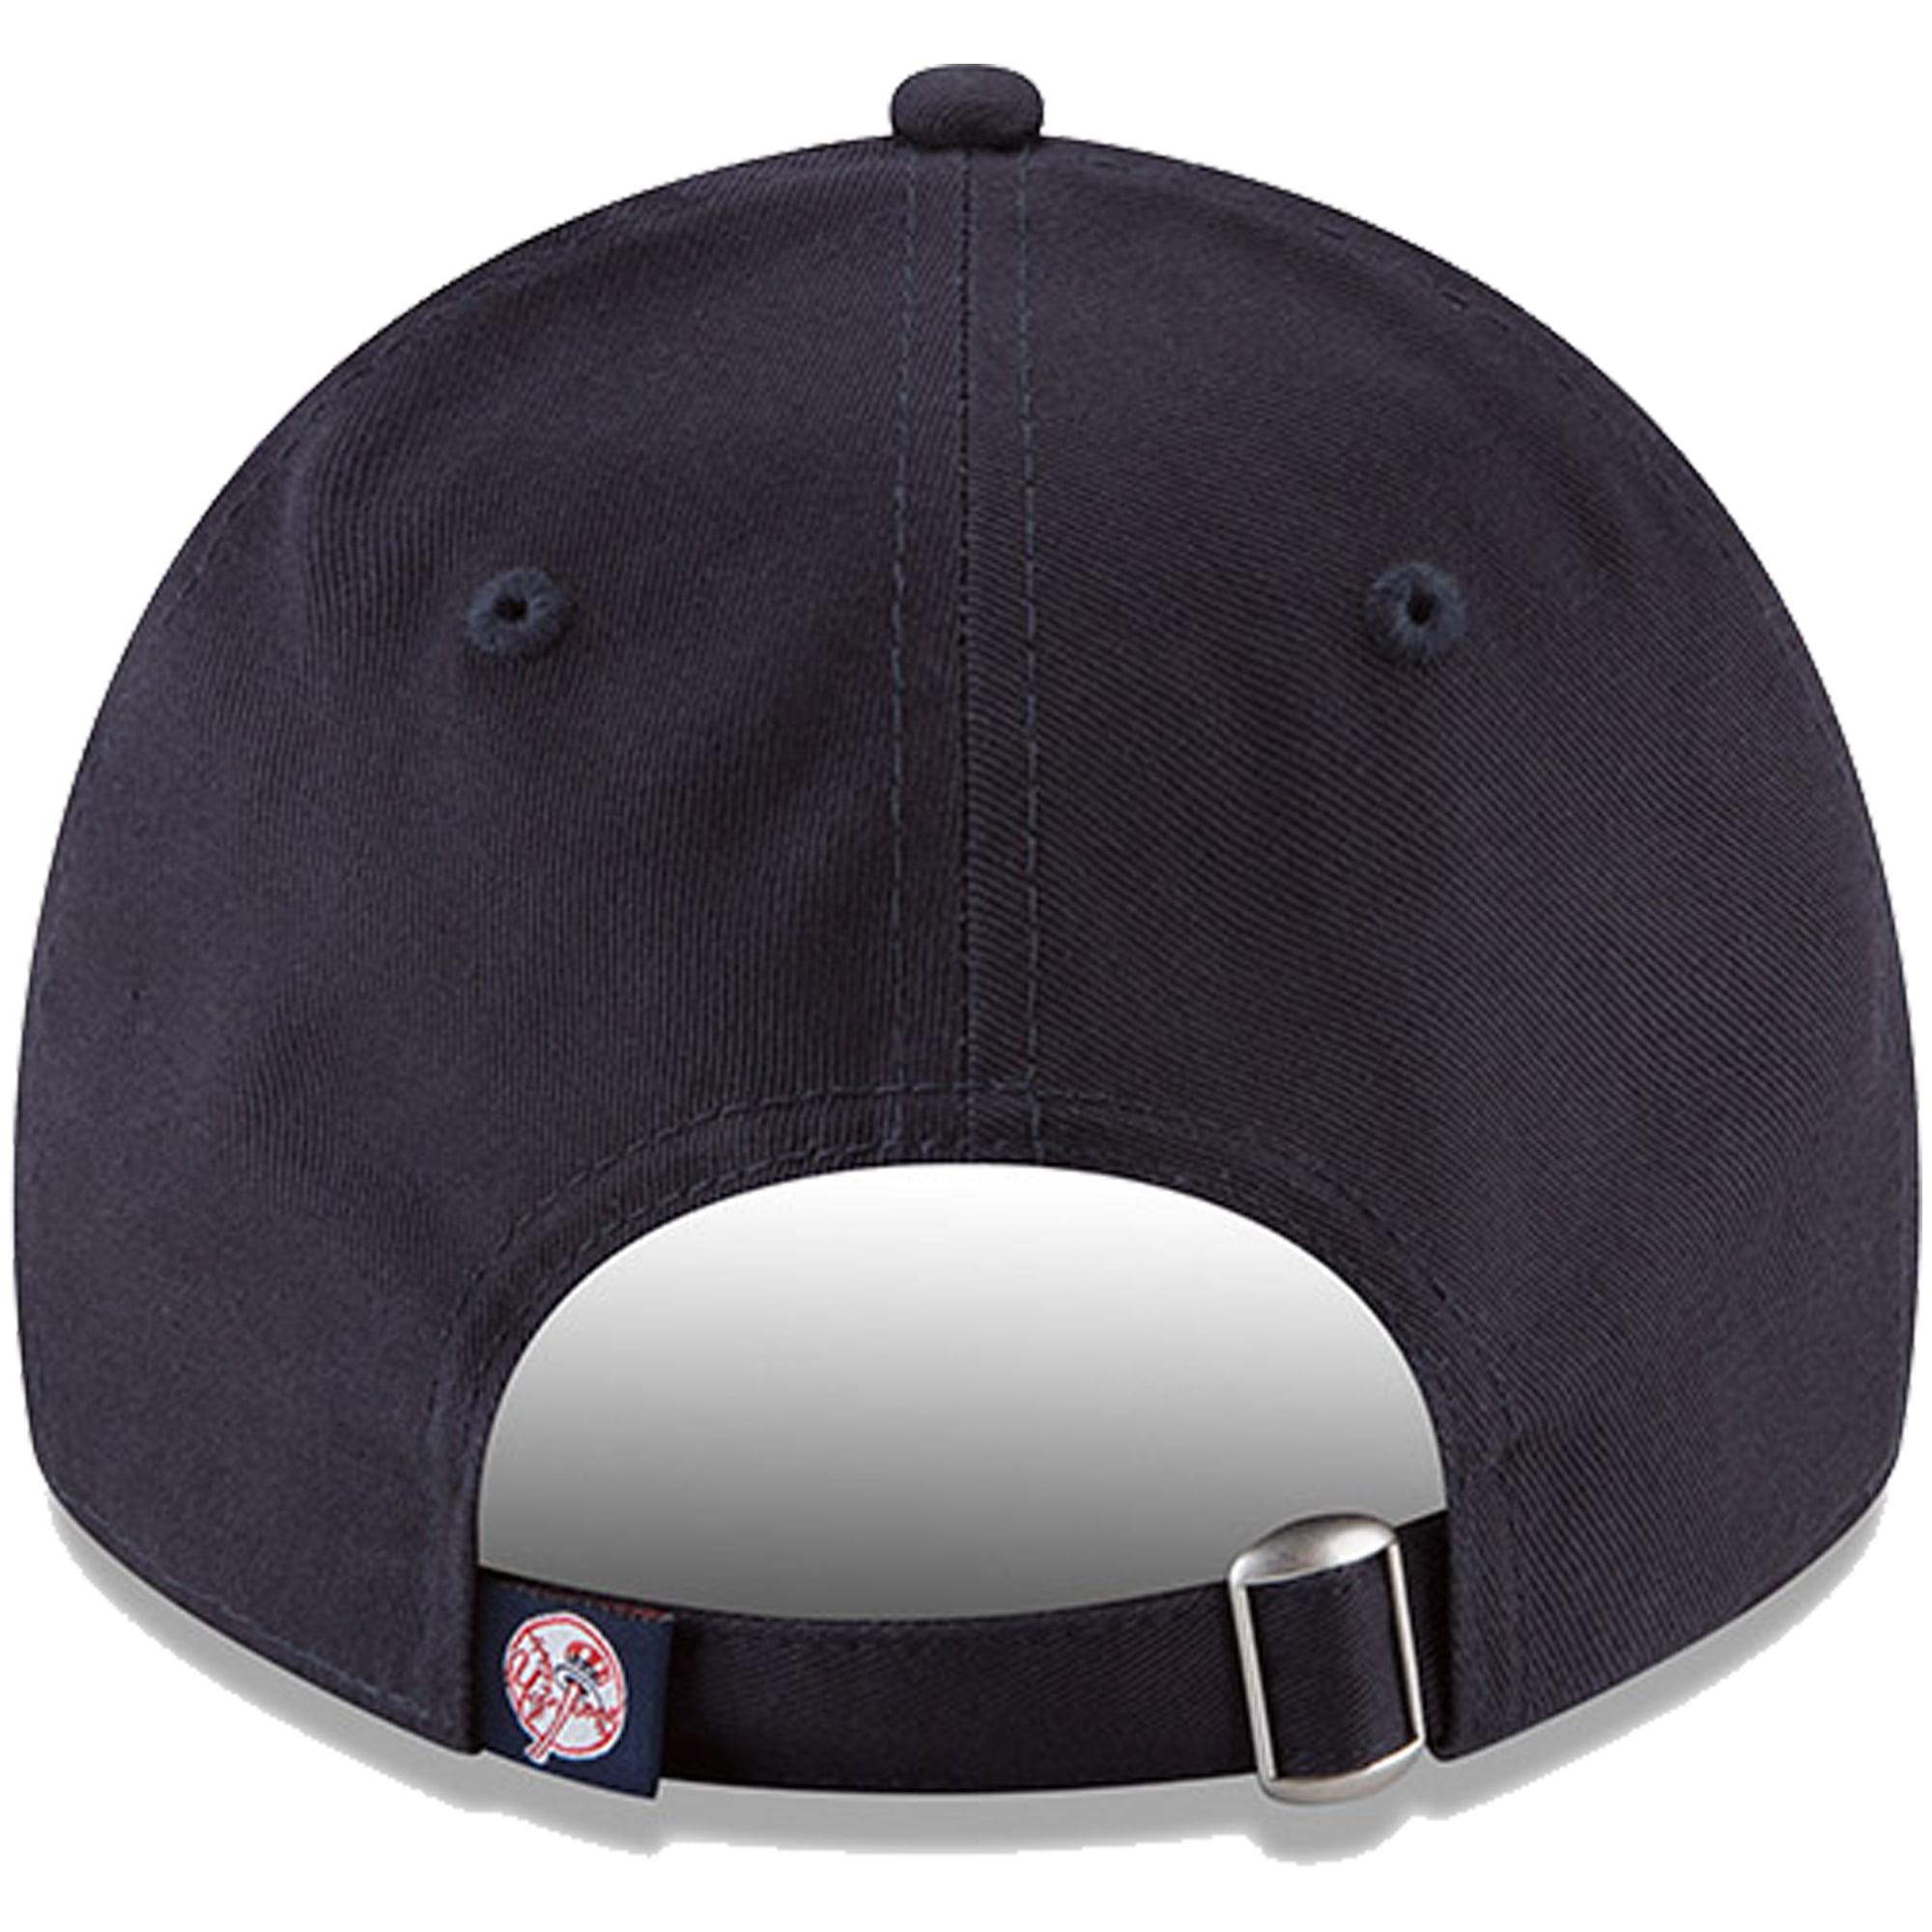 9c434d39ca904 New York Yankees New Era Women s 2018 Postseason Side Patch 9TWENTY  Adjustable Hat - Navy - OSFA - Walmart.com